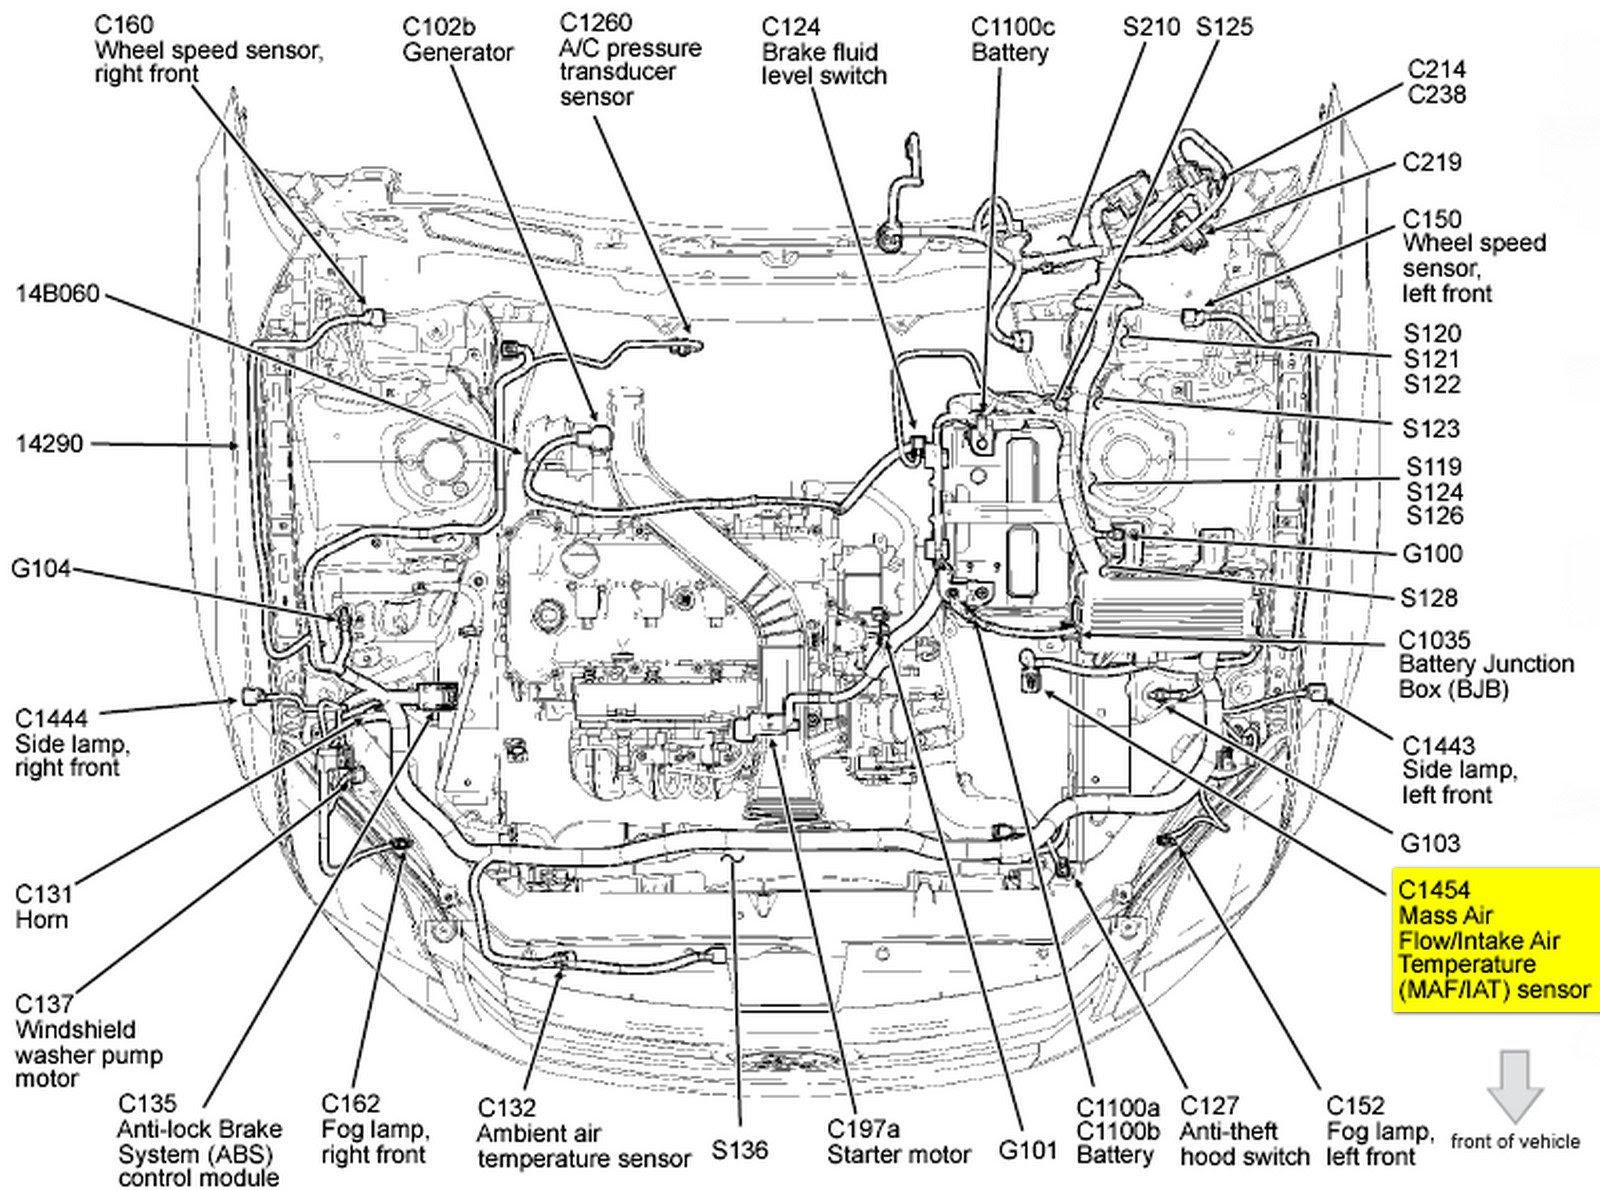 2010 Ford Fusion Engine Diagram Wiring Diagram Centre Centre Pavimentos Tarima Es